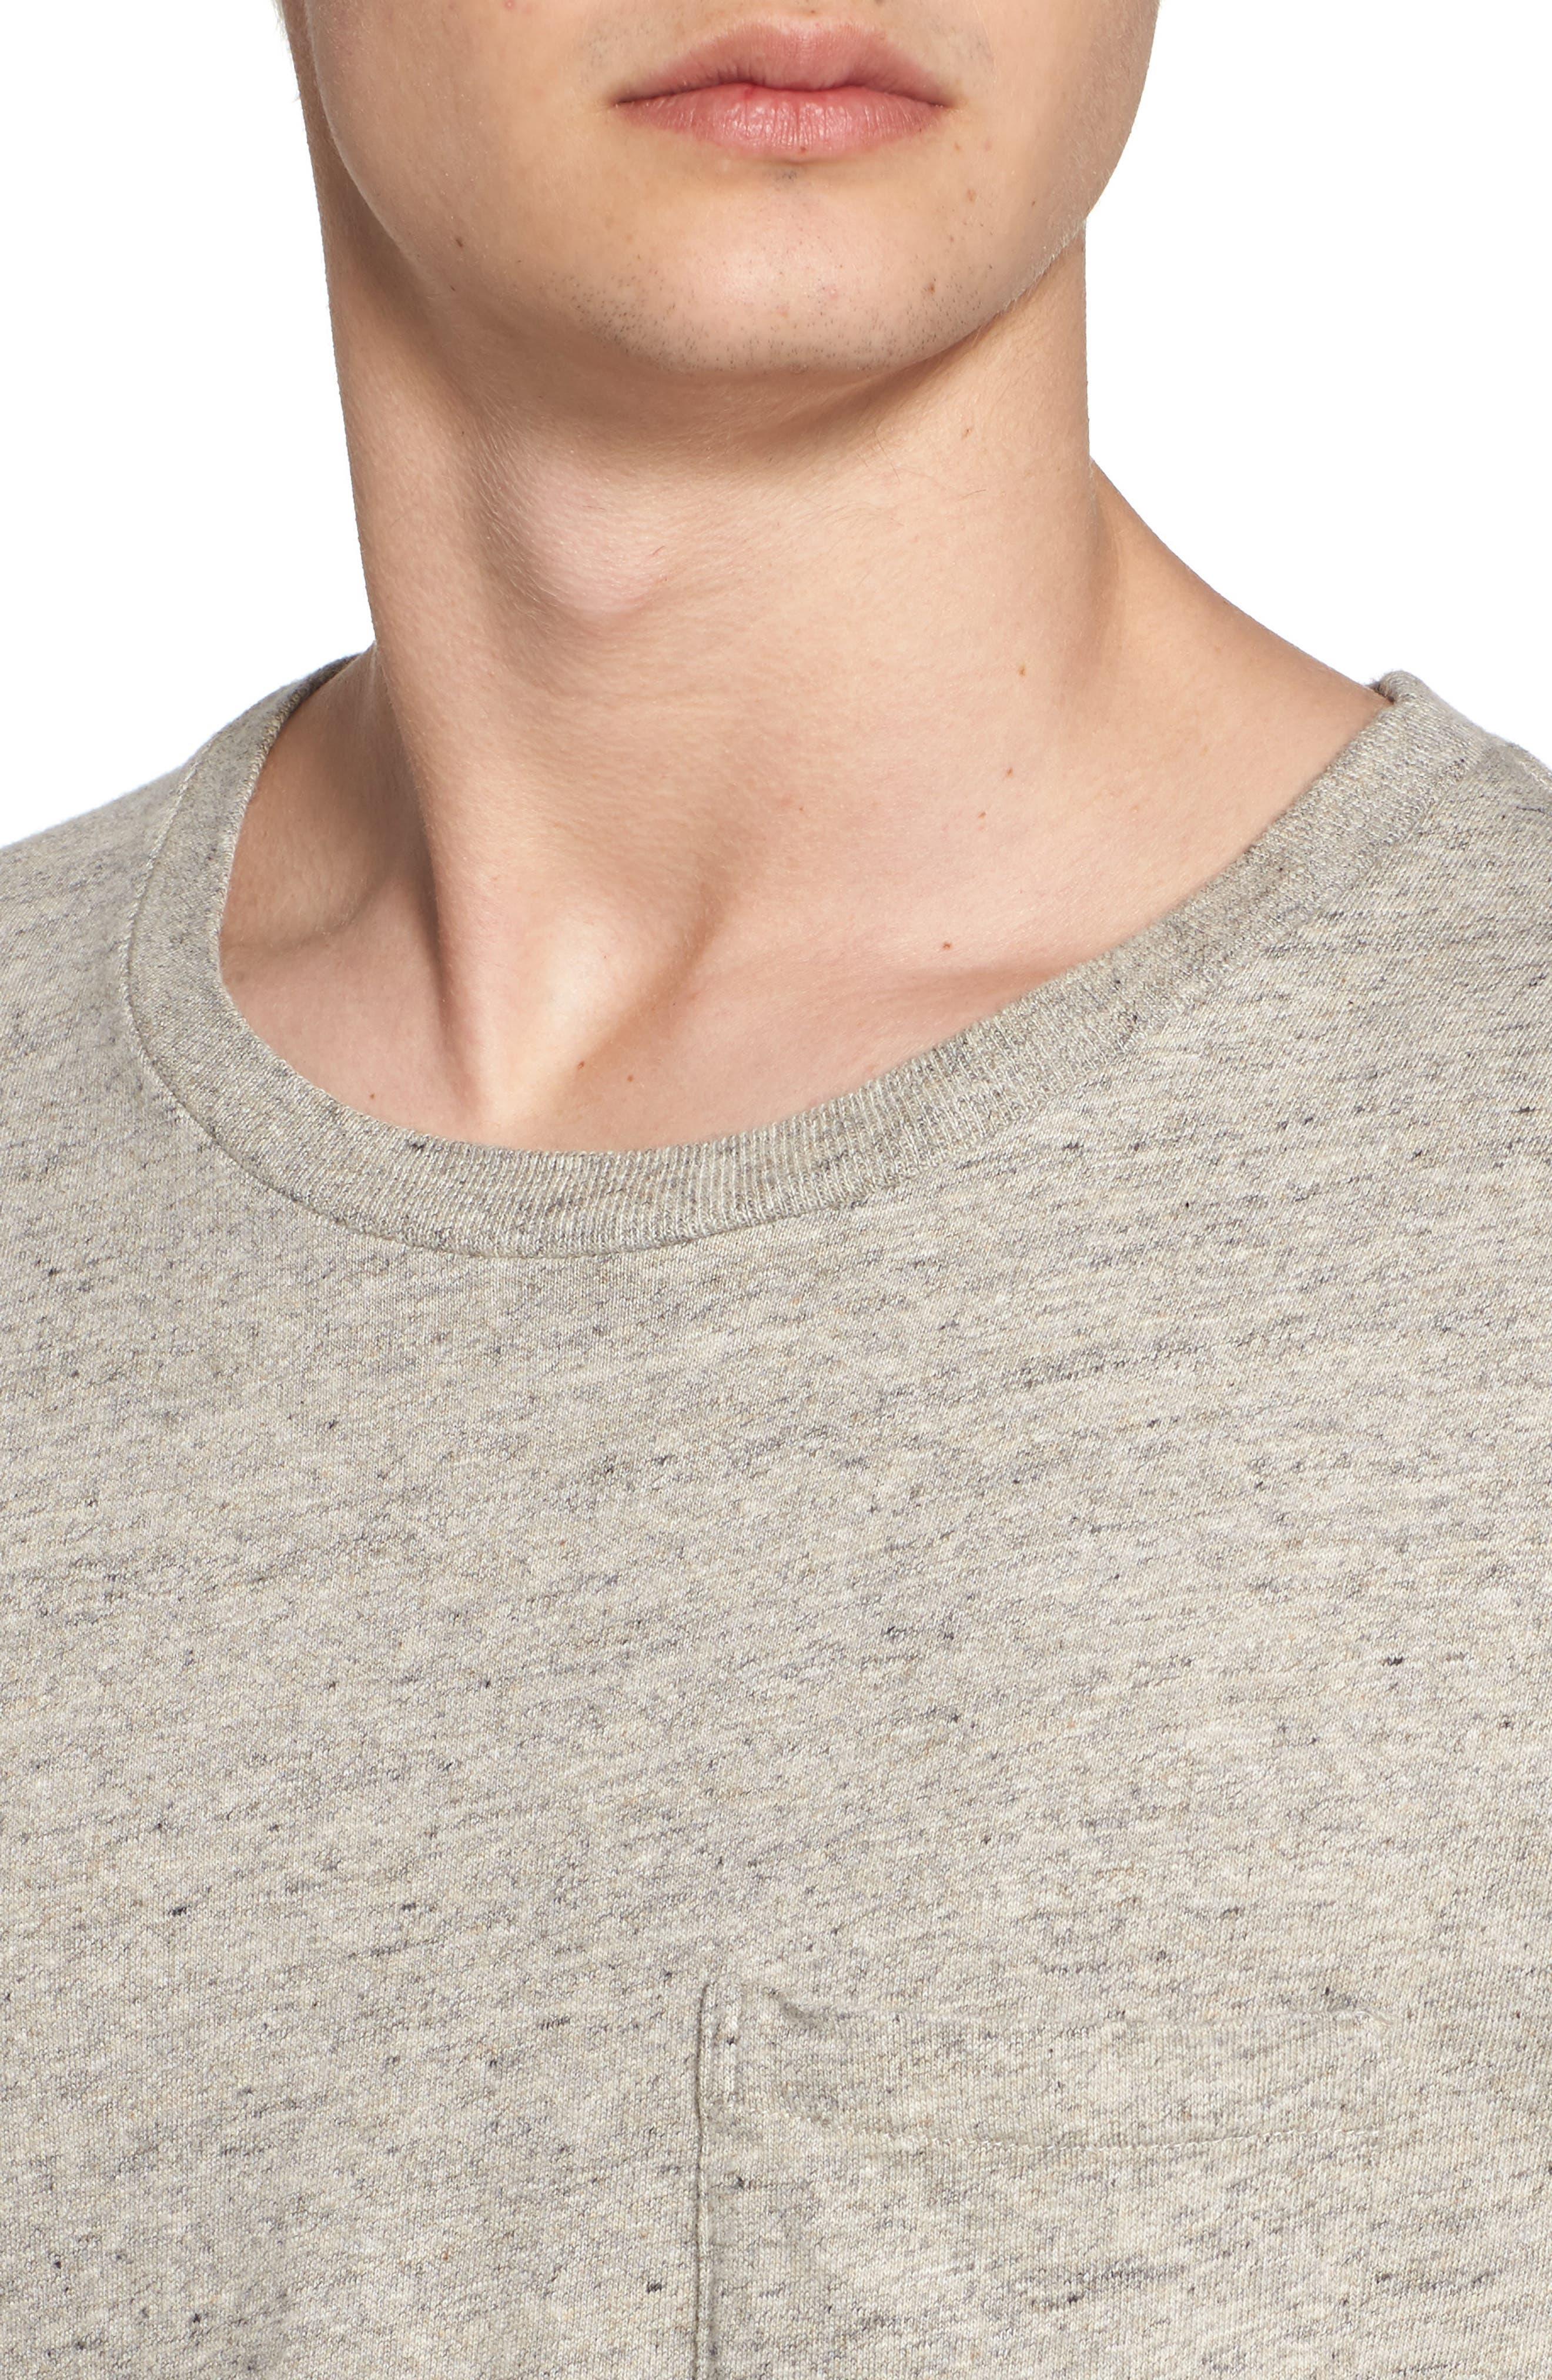 Levi's Vintage Clothing 1950s Sportswear Pocket T-Shirt,                             Alternate thumbnail 4, color,                             Grey